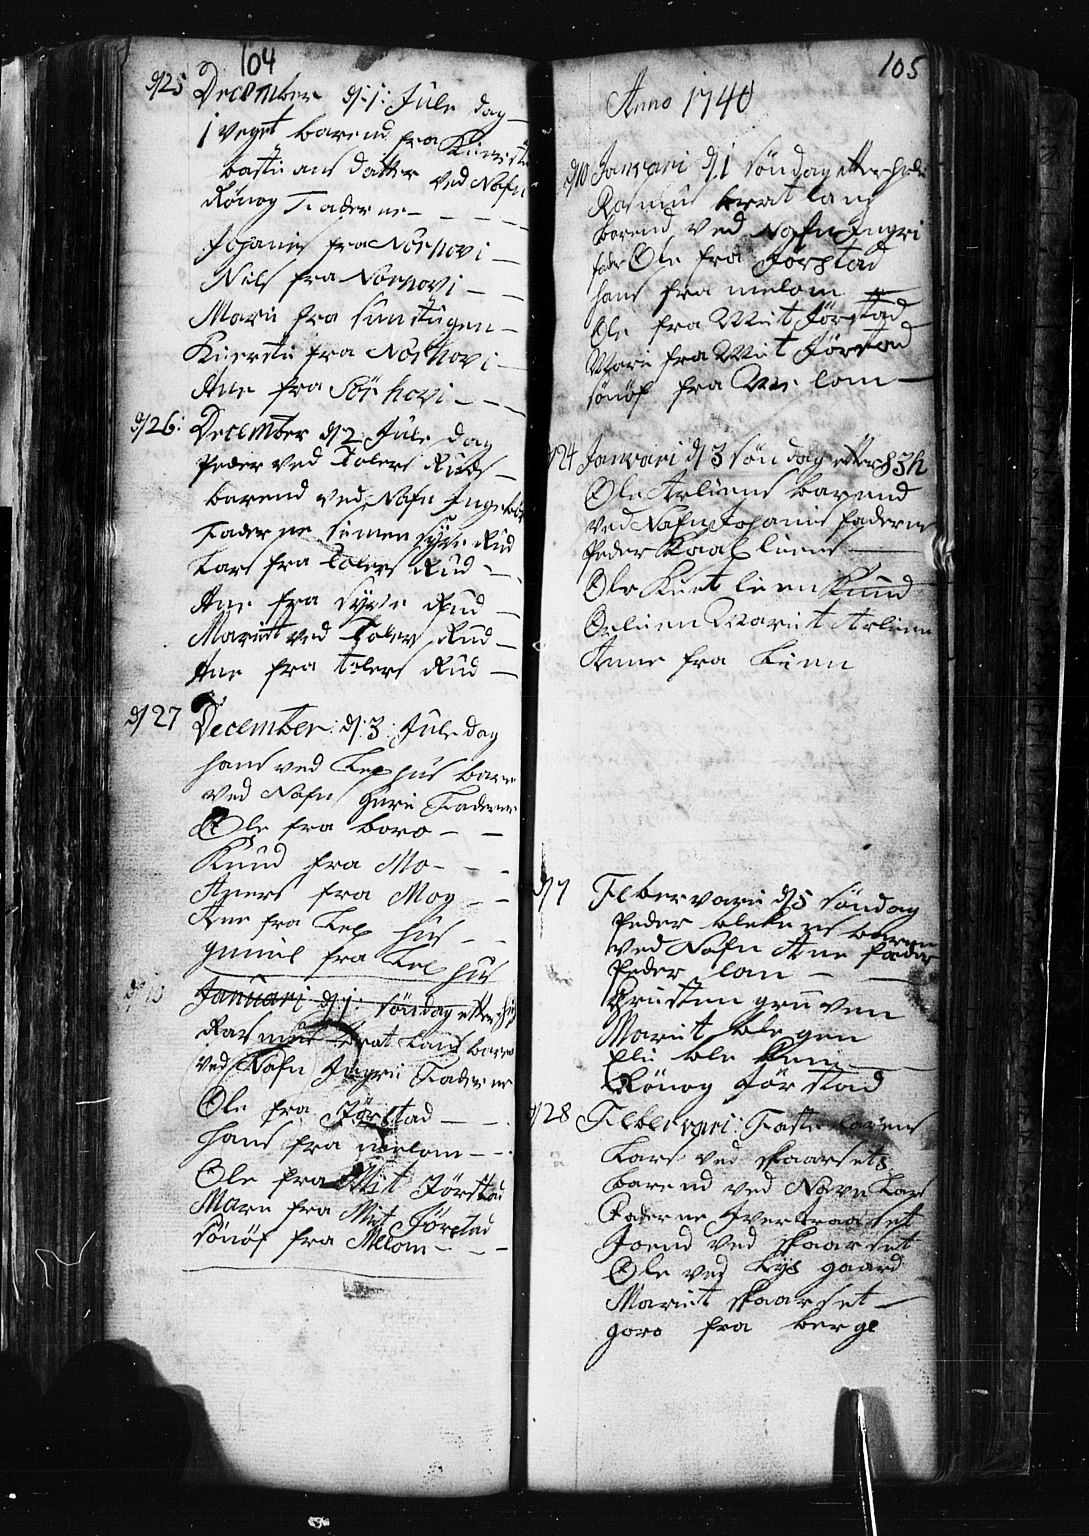 SAH, Fåberg prestekontor, Klokkerbok nr. 1, 1727-1767, s. 104-105